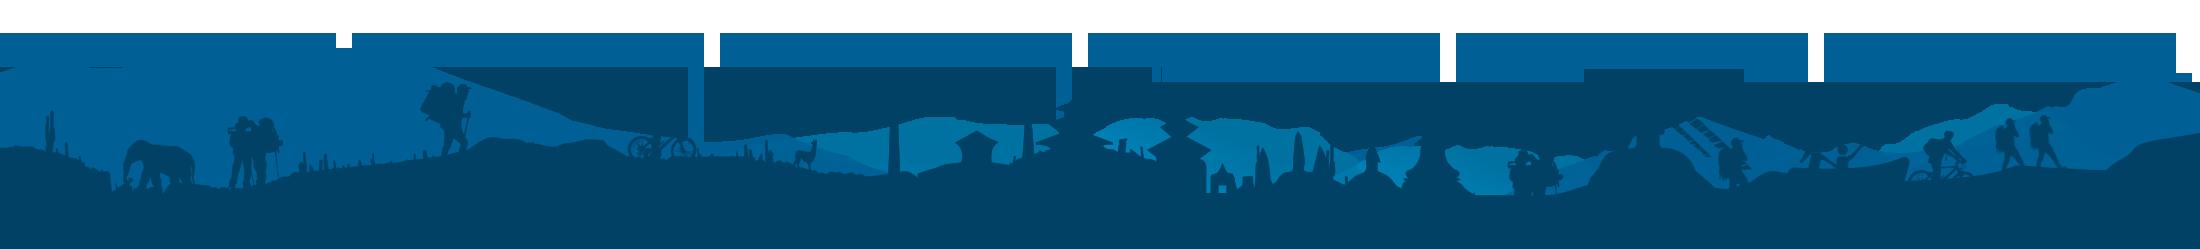 Nepal Tourism Activities